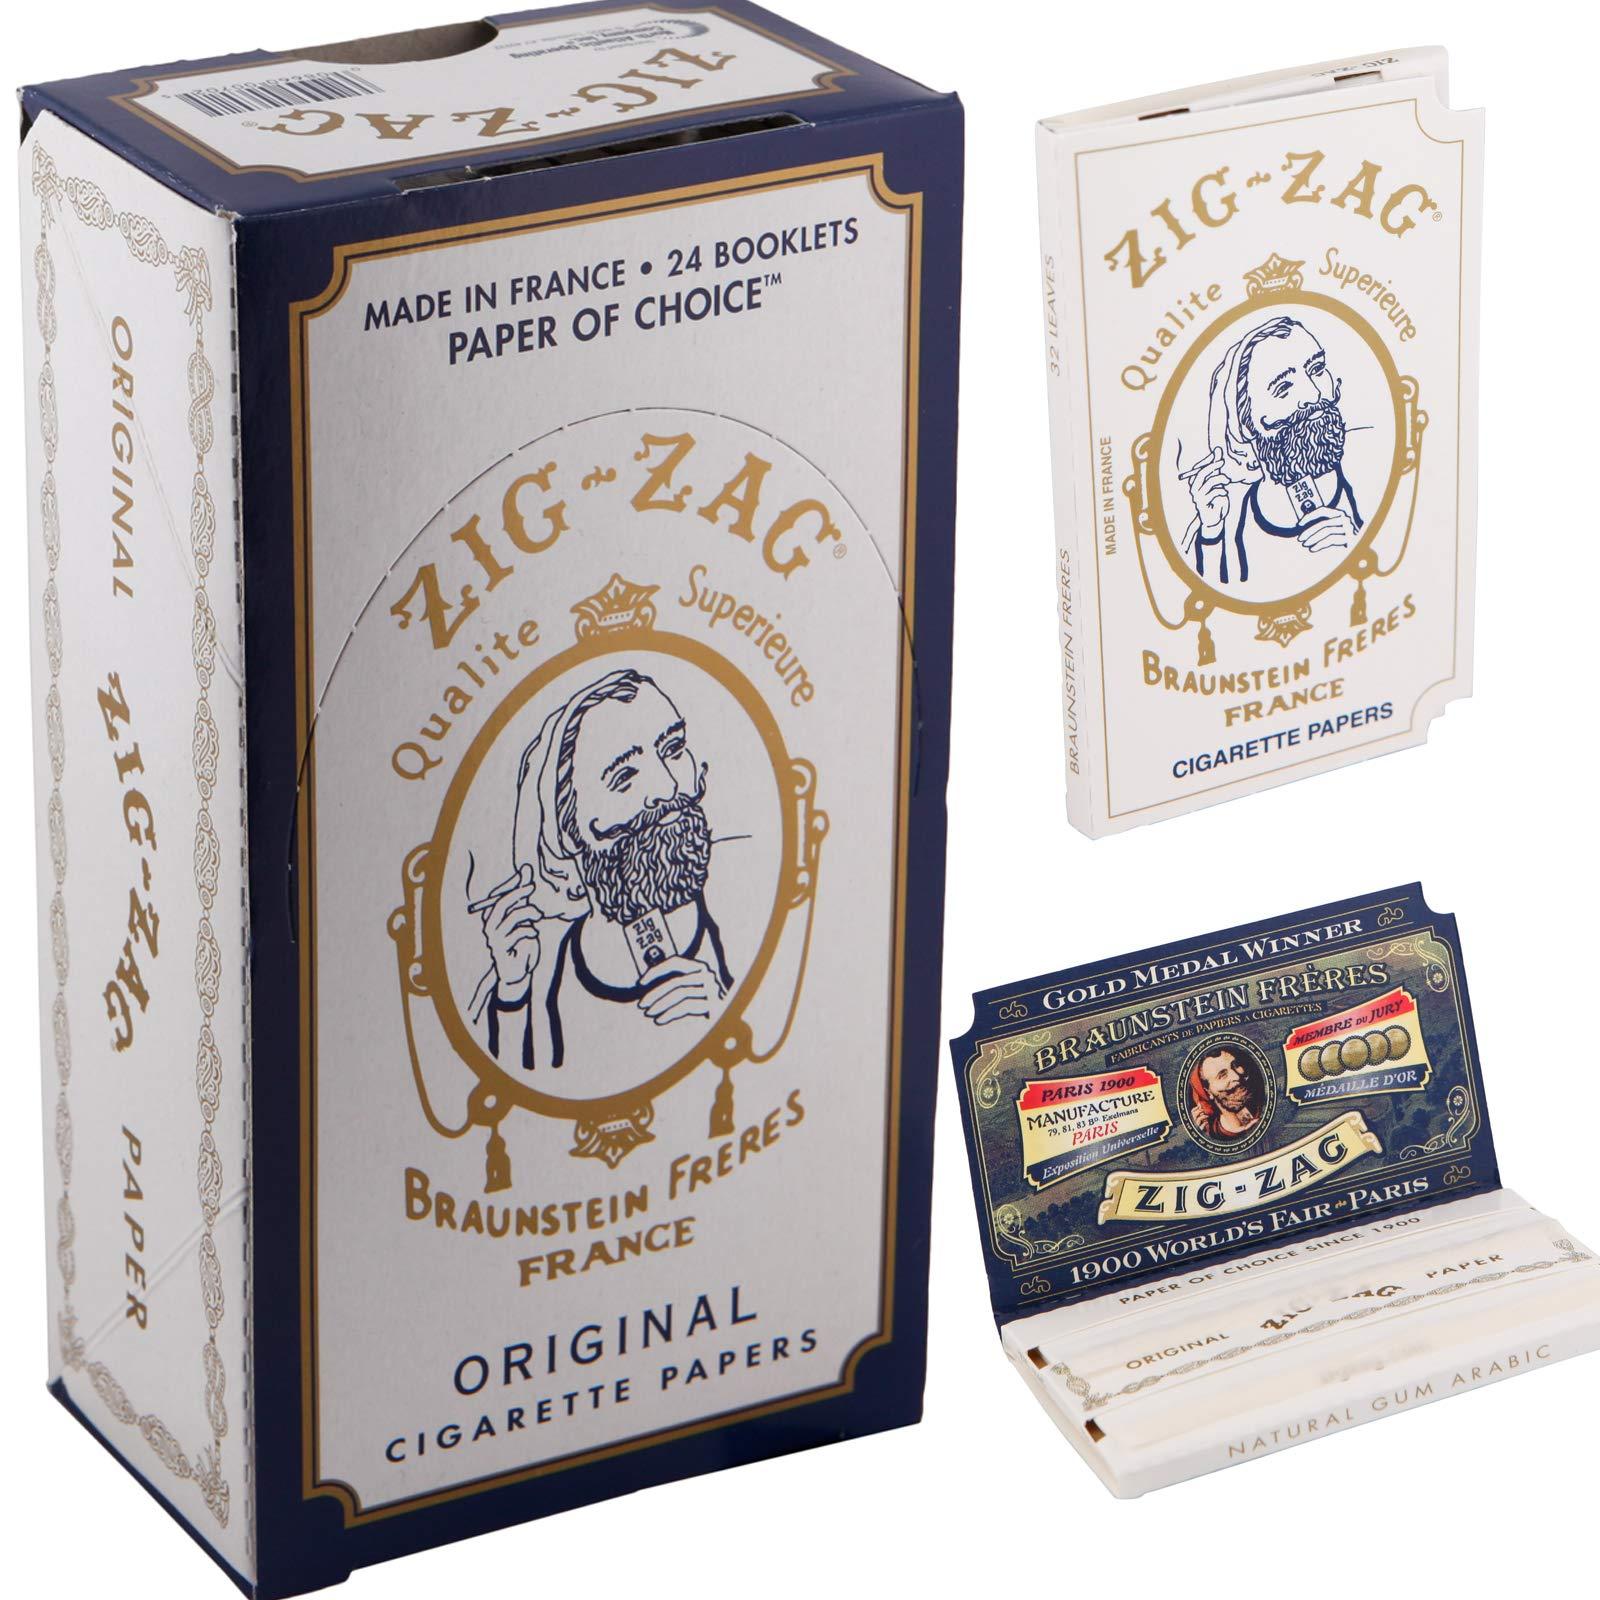 Zig Zag Full Box Cigarette Rolling Paper, Original White by Zig Zag